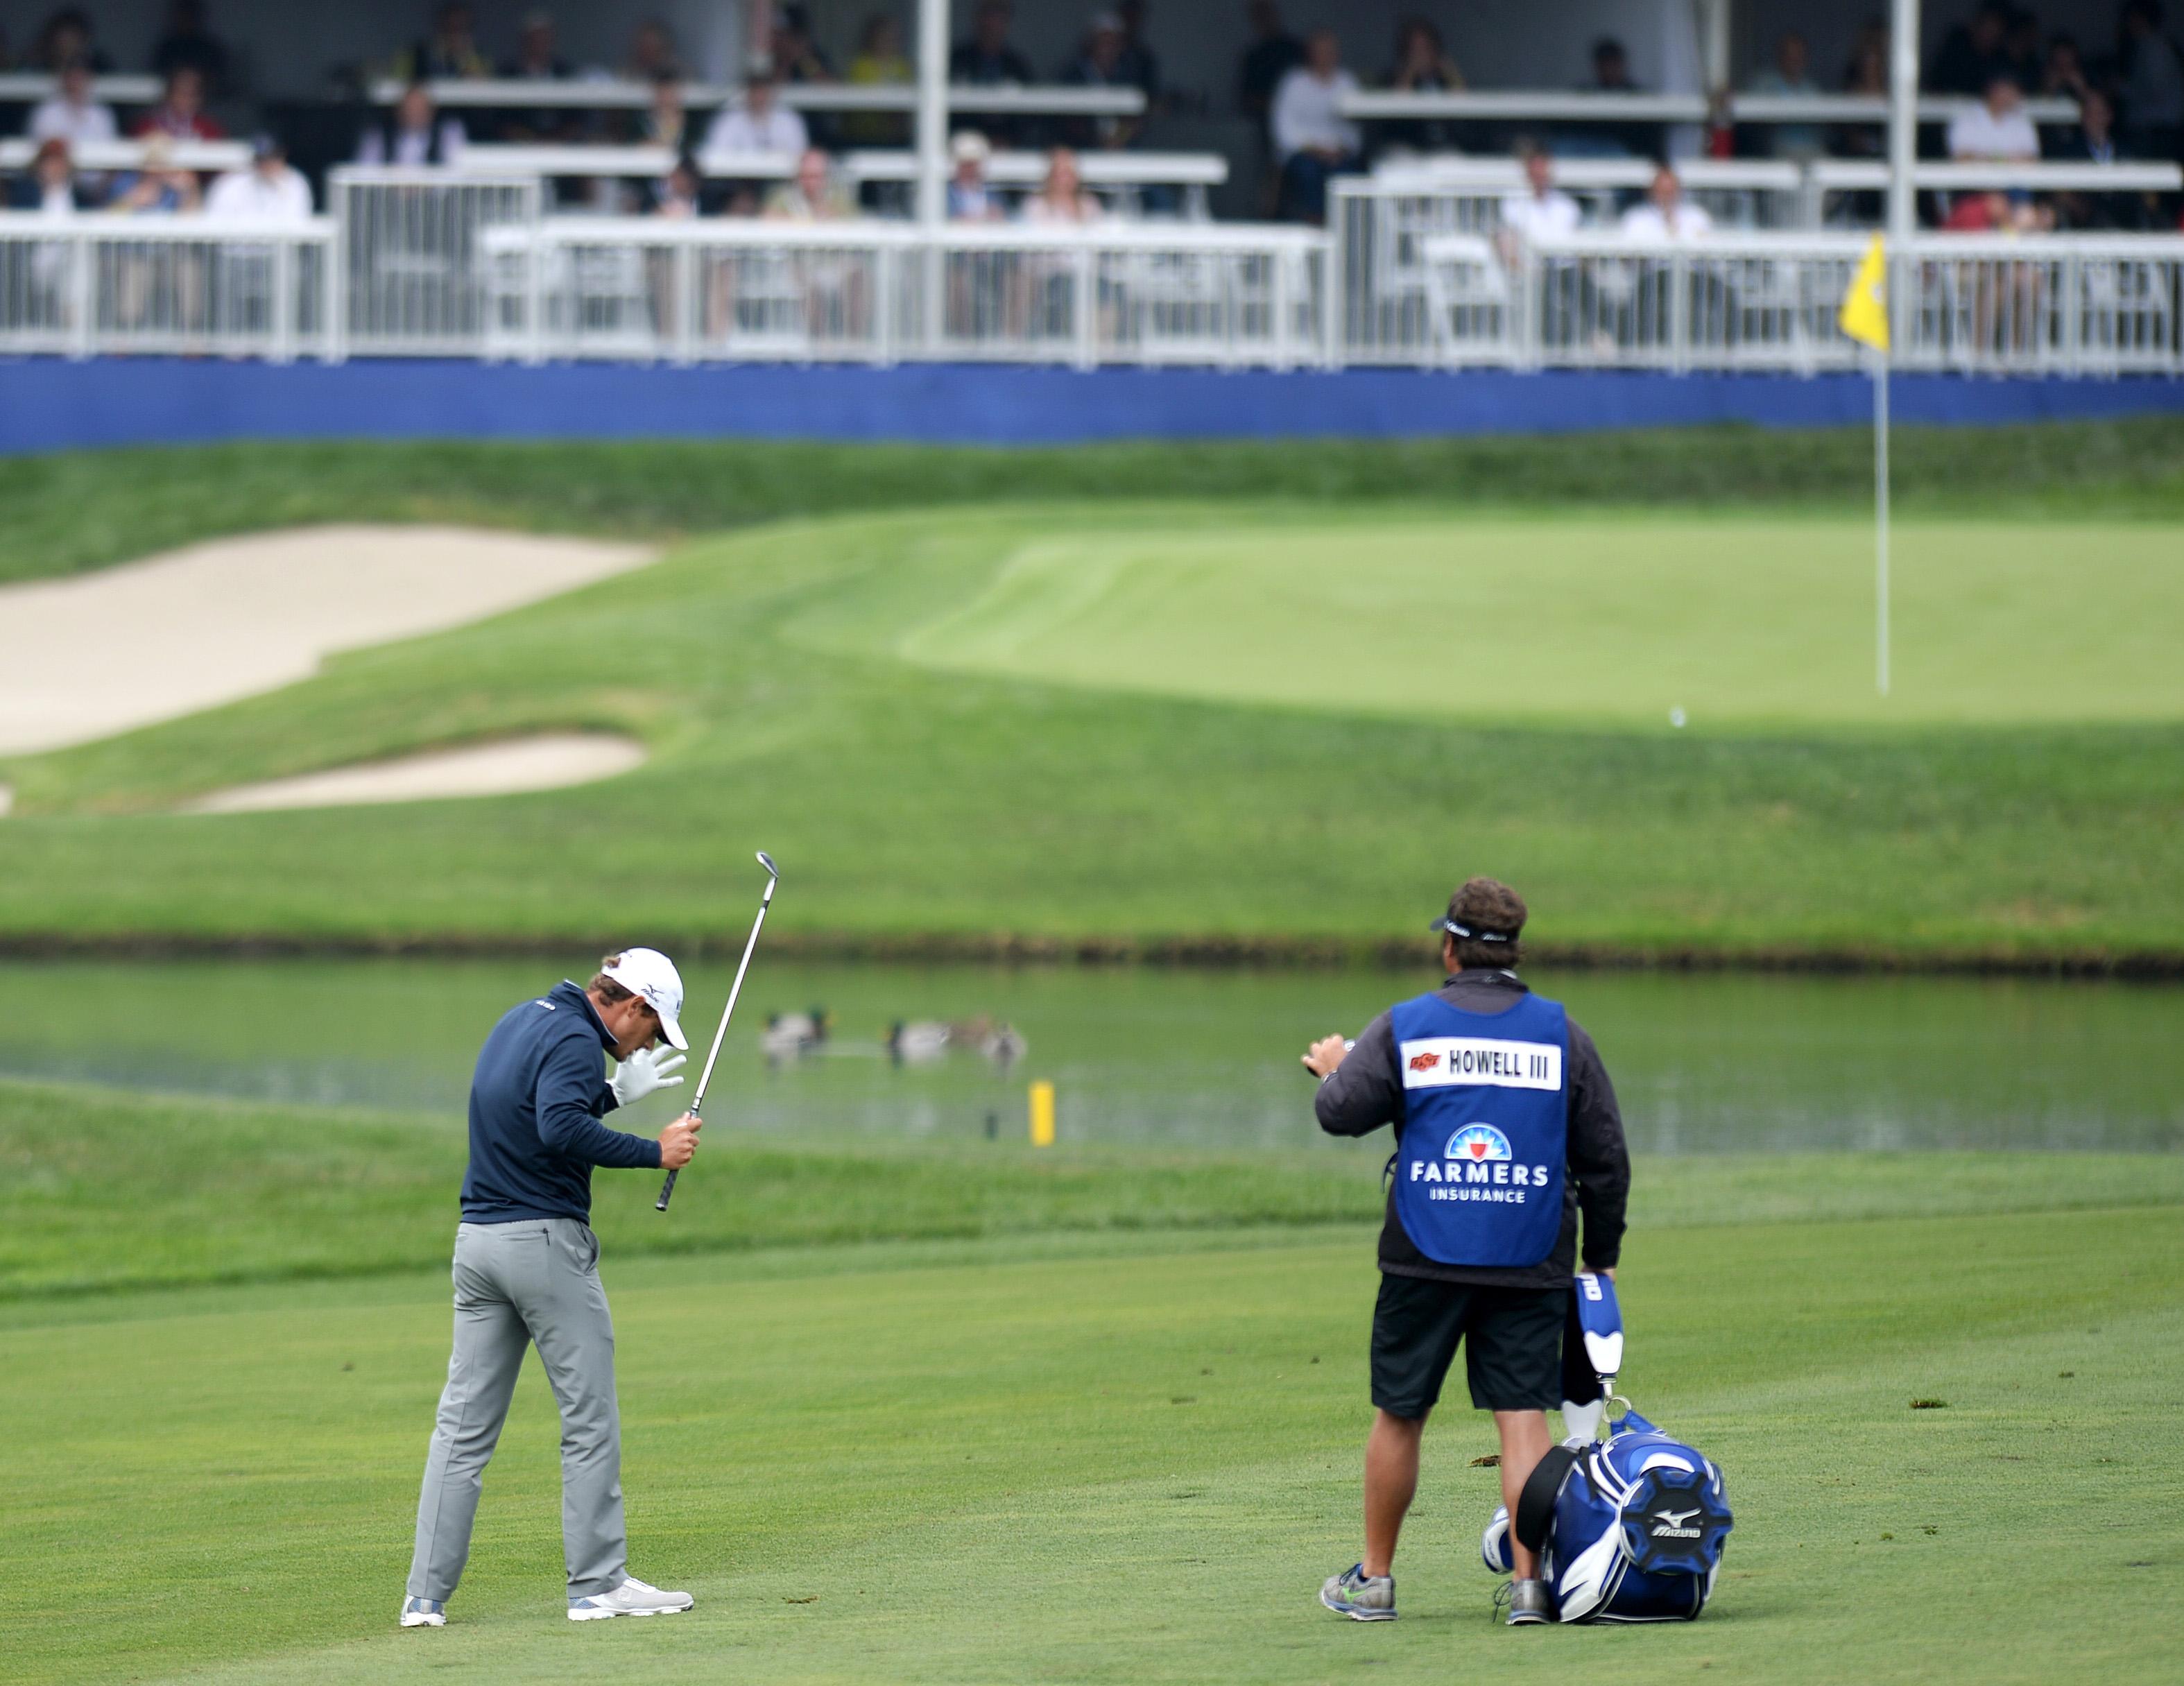 PGA: Farmers Insurance Open-Final Round